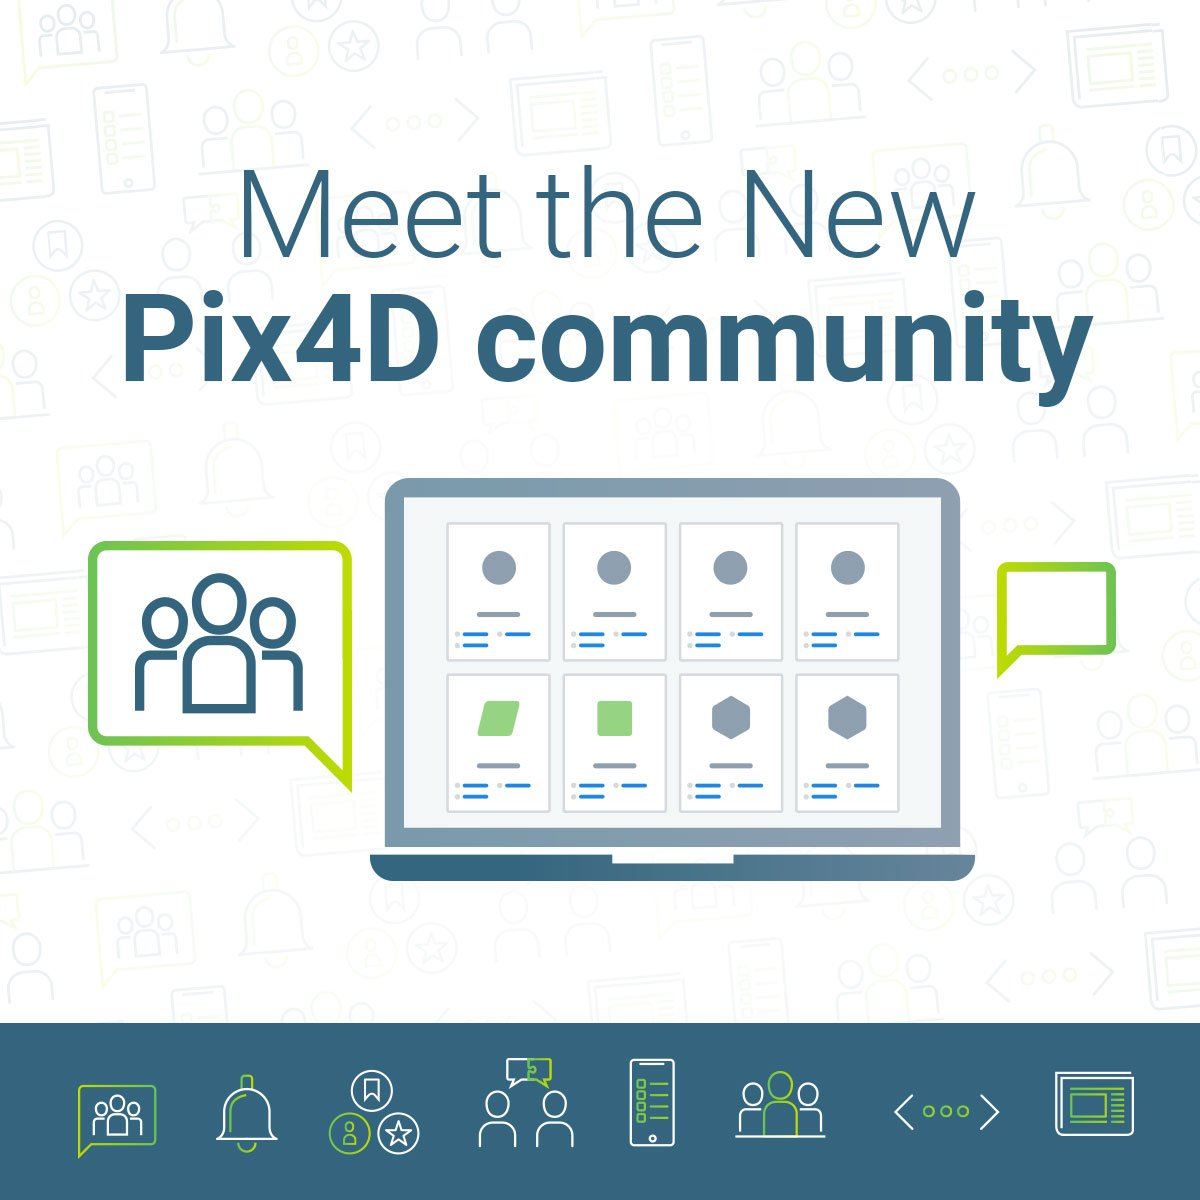 Pix4D tagged Tweets and Downloader | Twipu